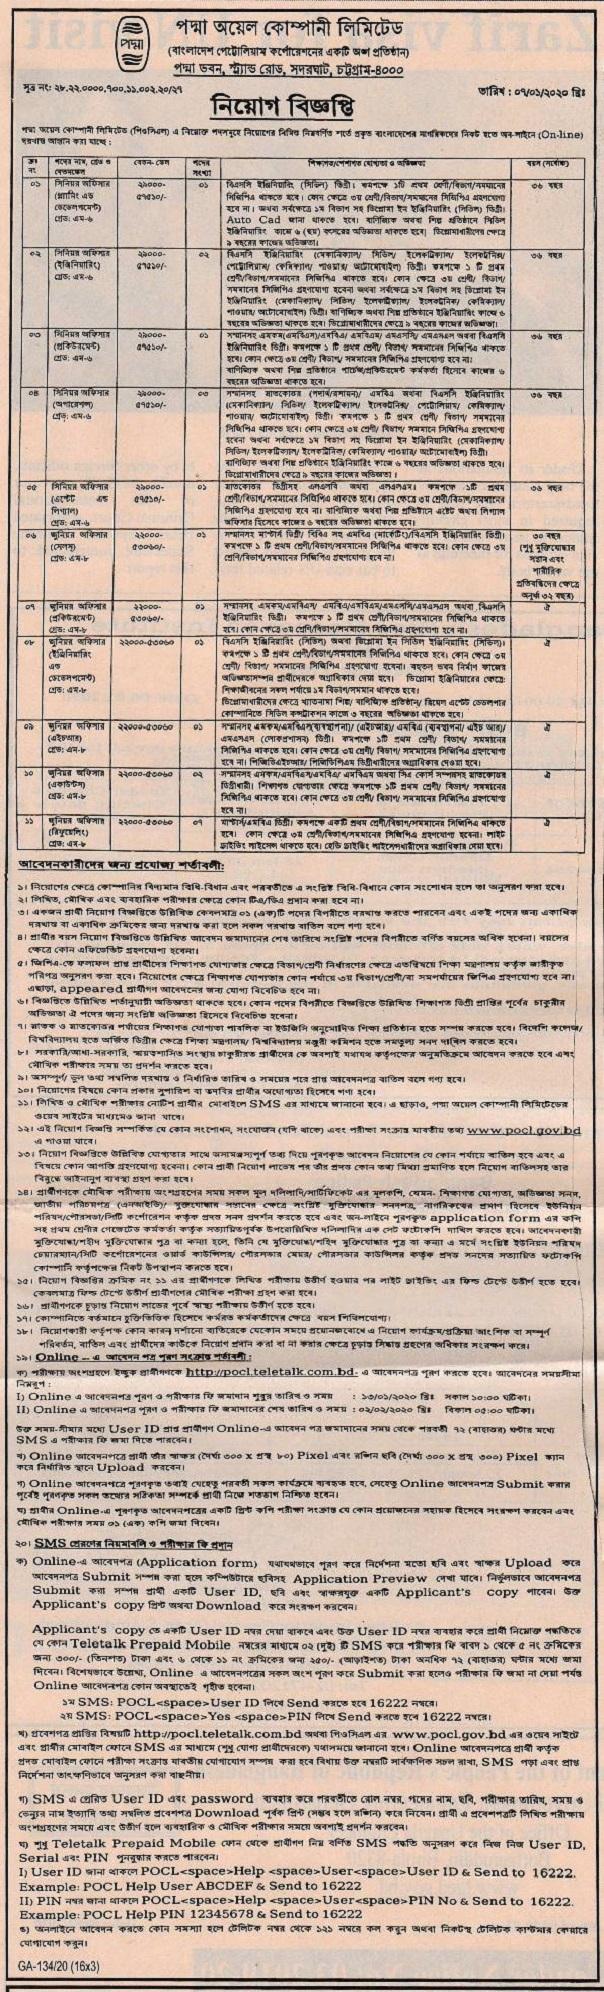 Padma Oil Company Limited Job Circular 2020